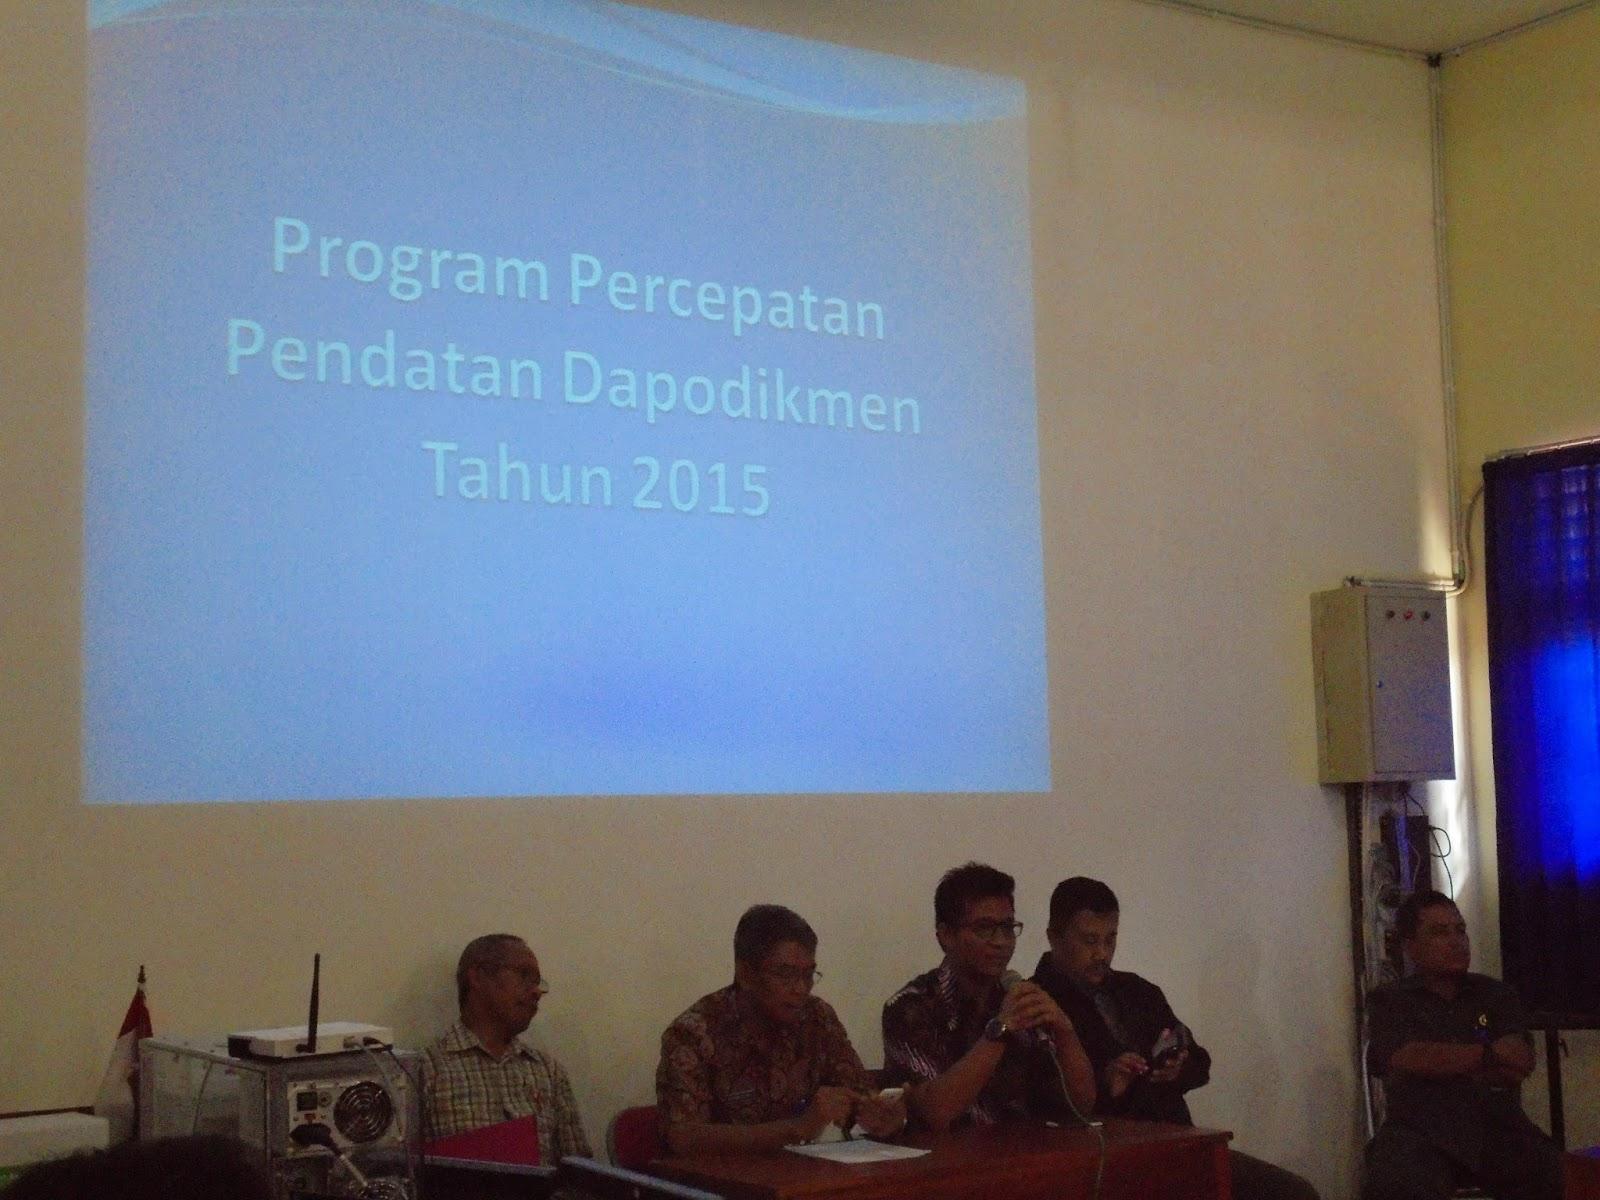 Program Percepatan Pendatan Dapodikmen Tahun 2015